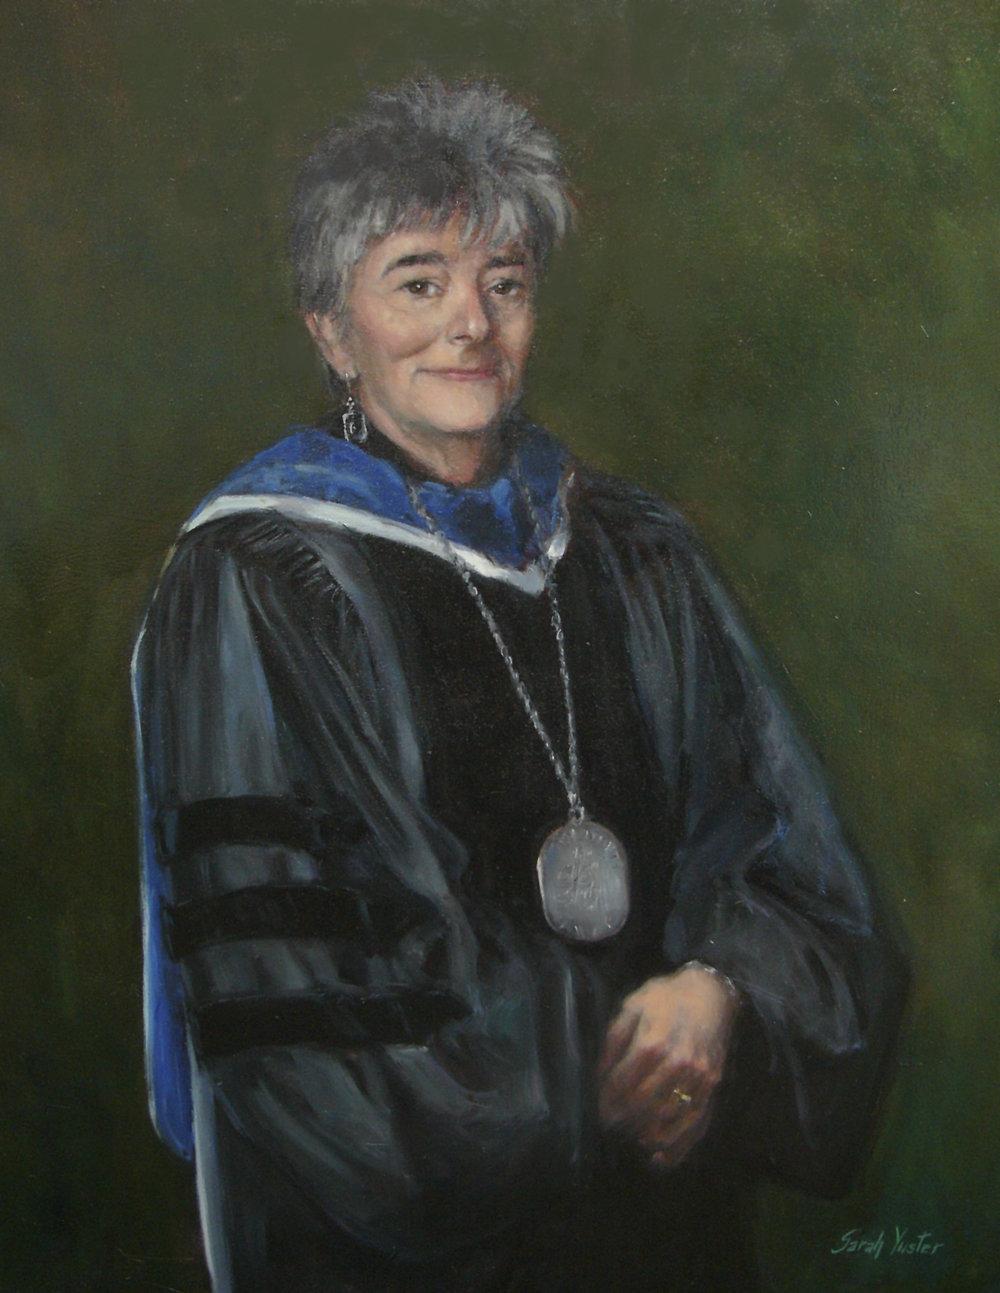 Dr. Marlene Springer